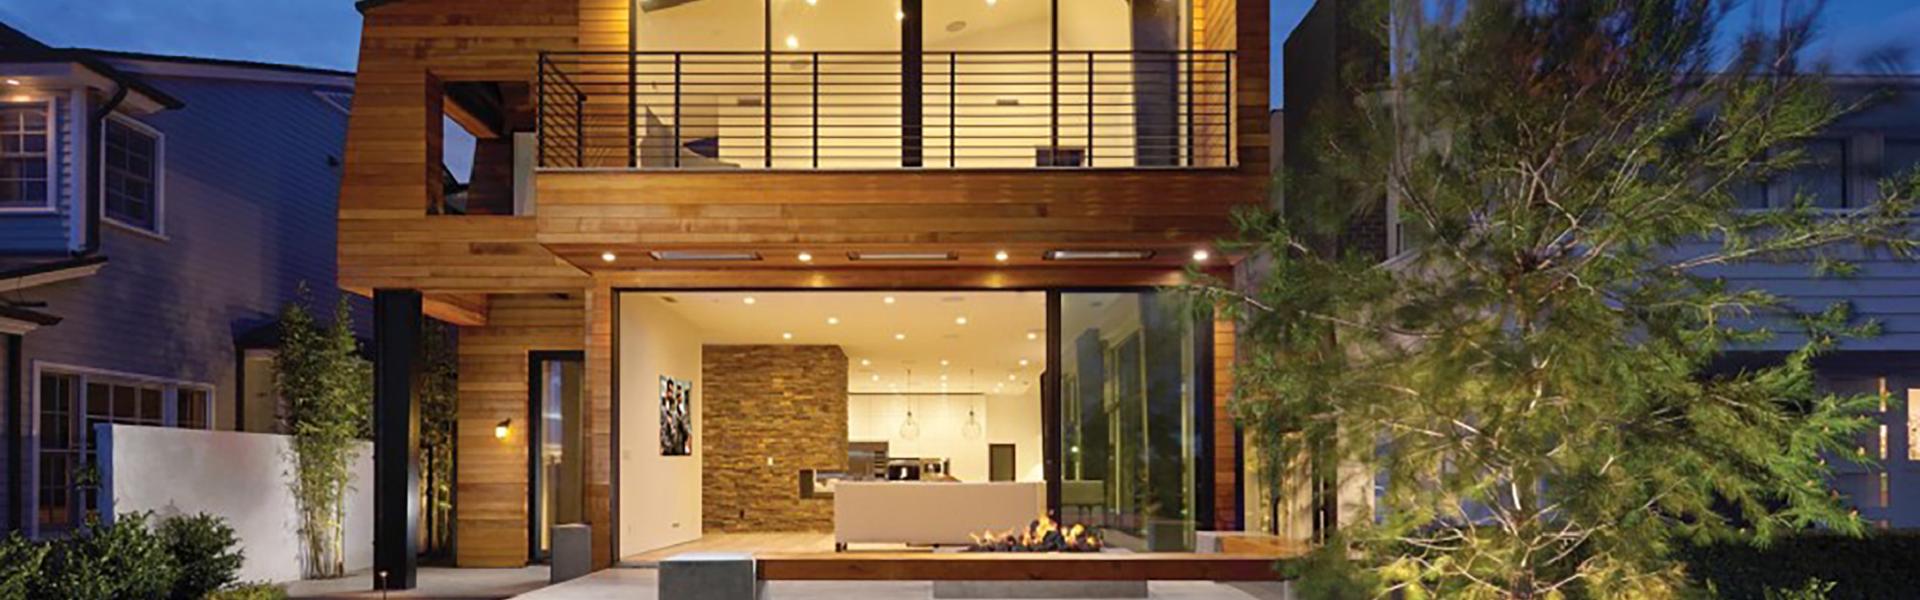 Smart home installation by ZHiFi for La Canada